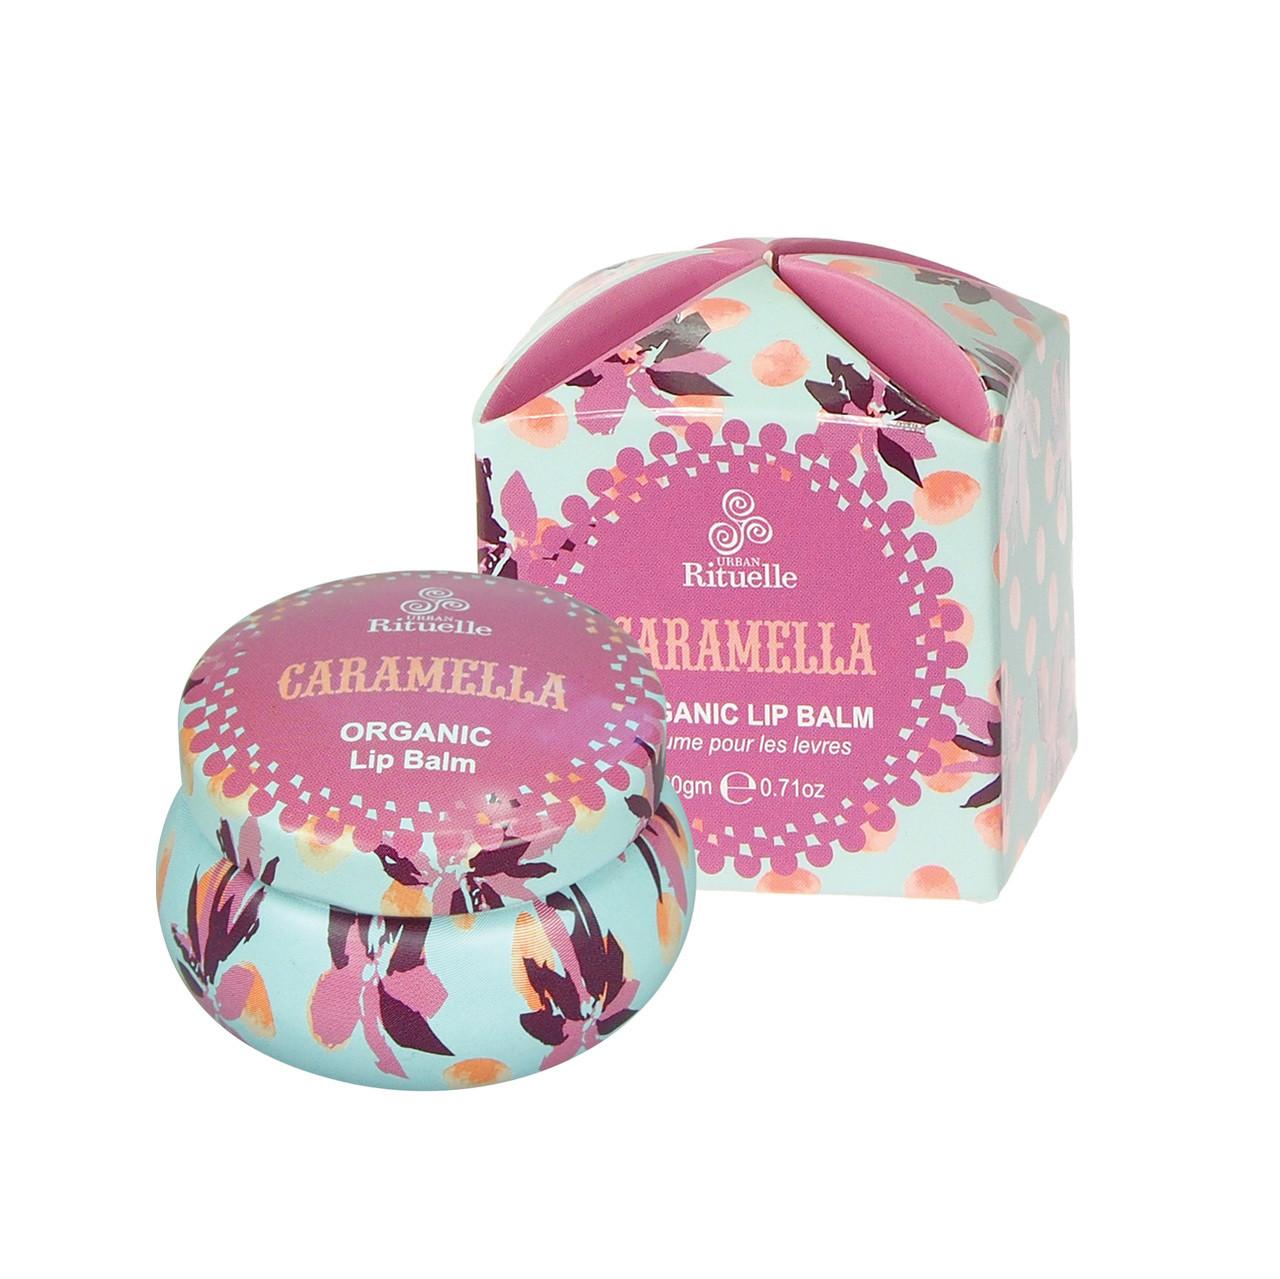 Caramella Organic Lip Balm - Sweet Treats - Urban Rituelle